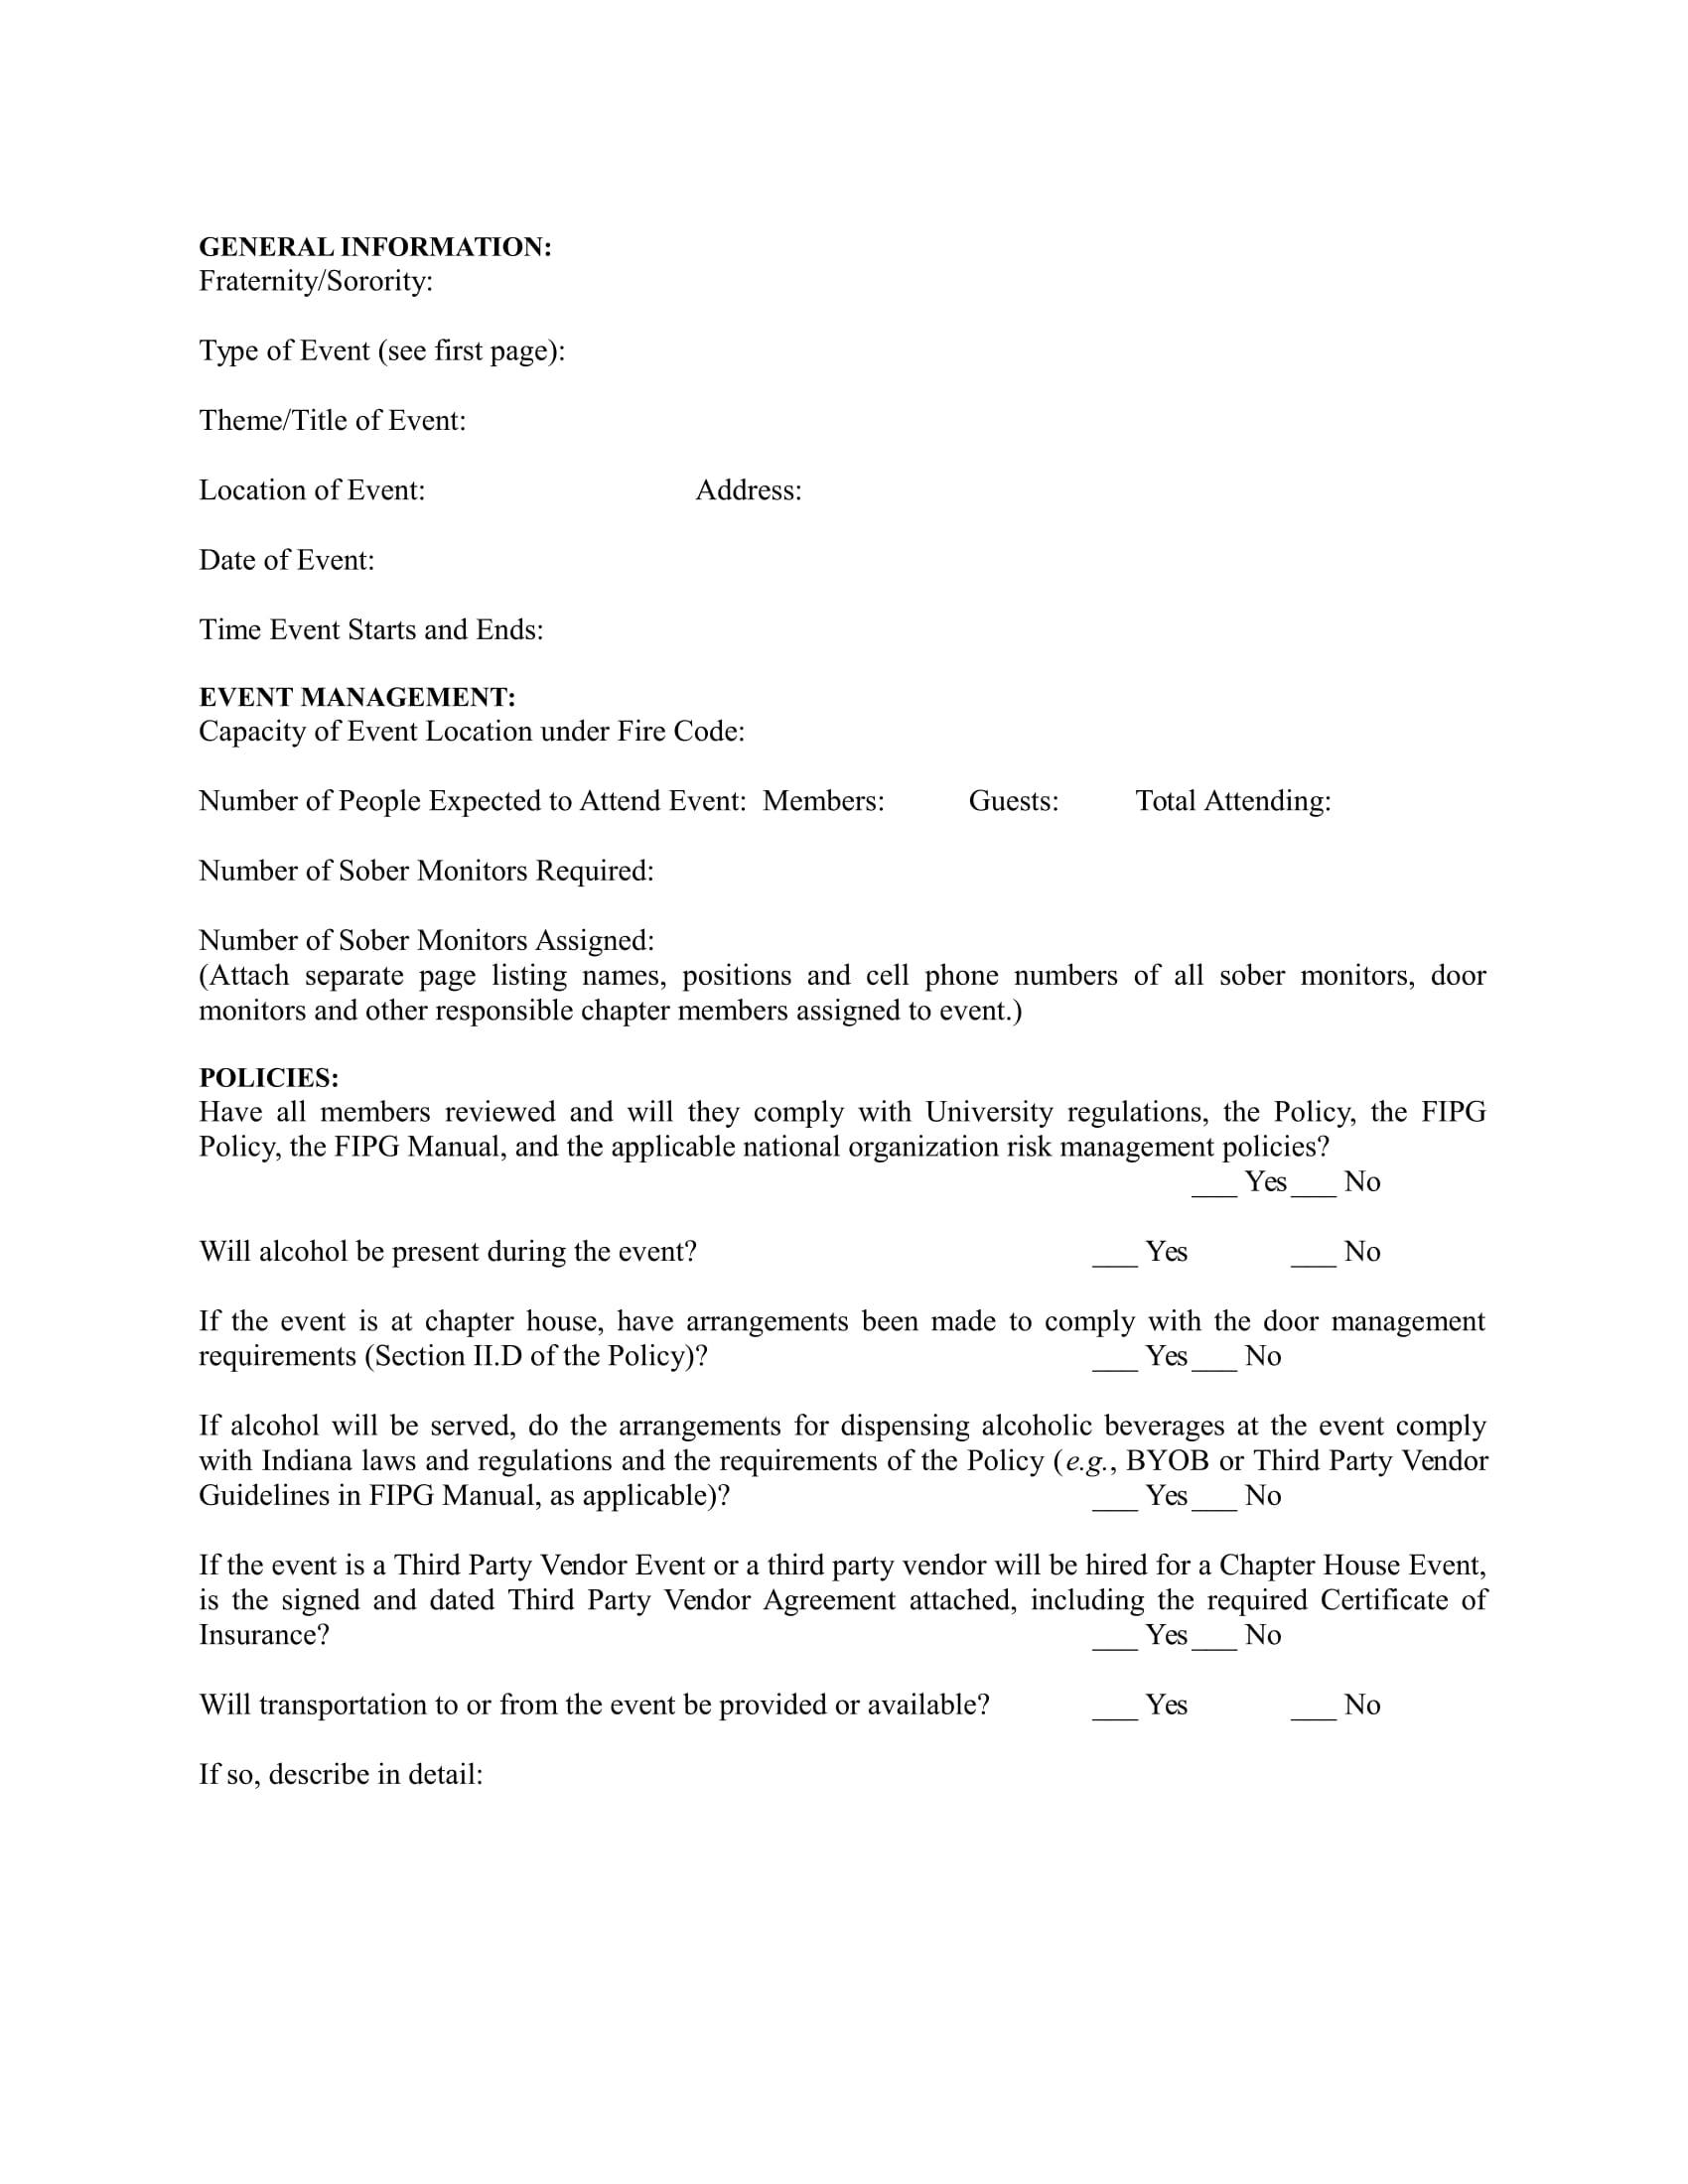 fraternity event registration form 2